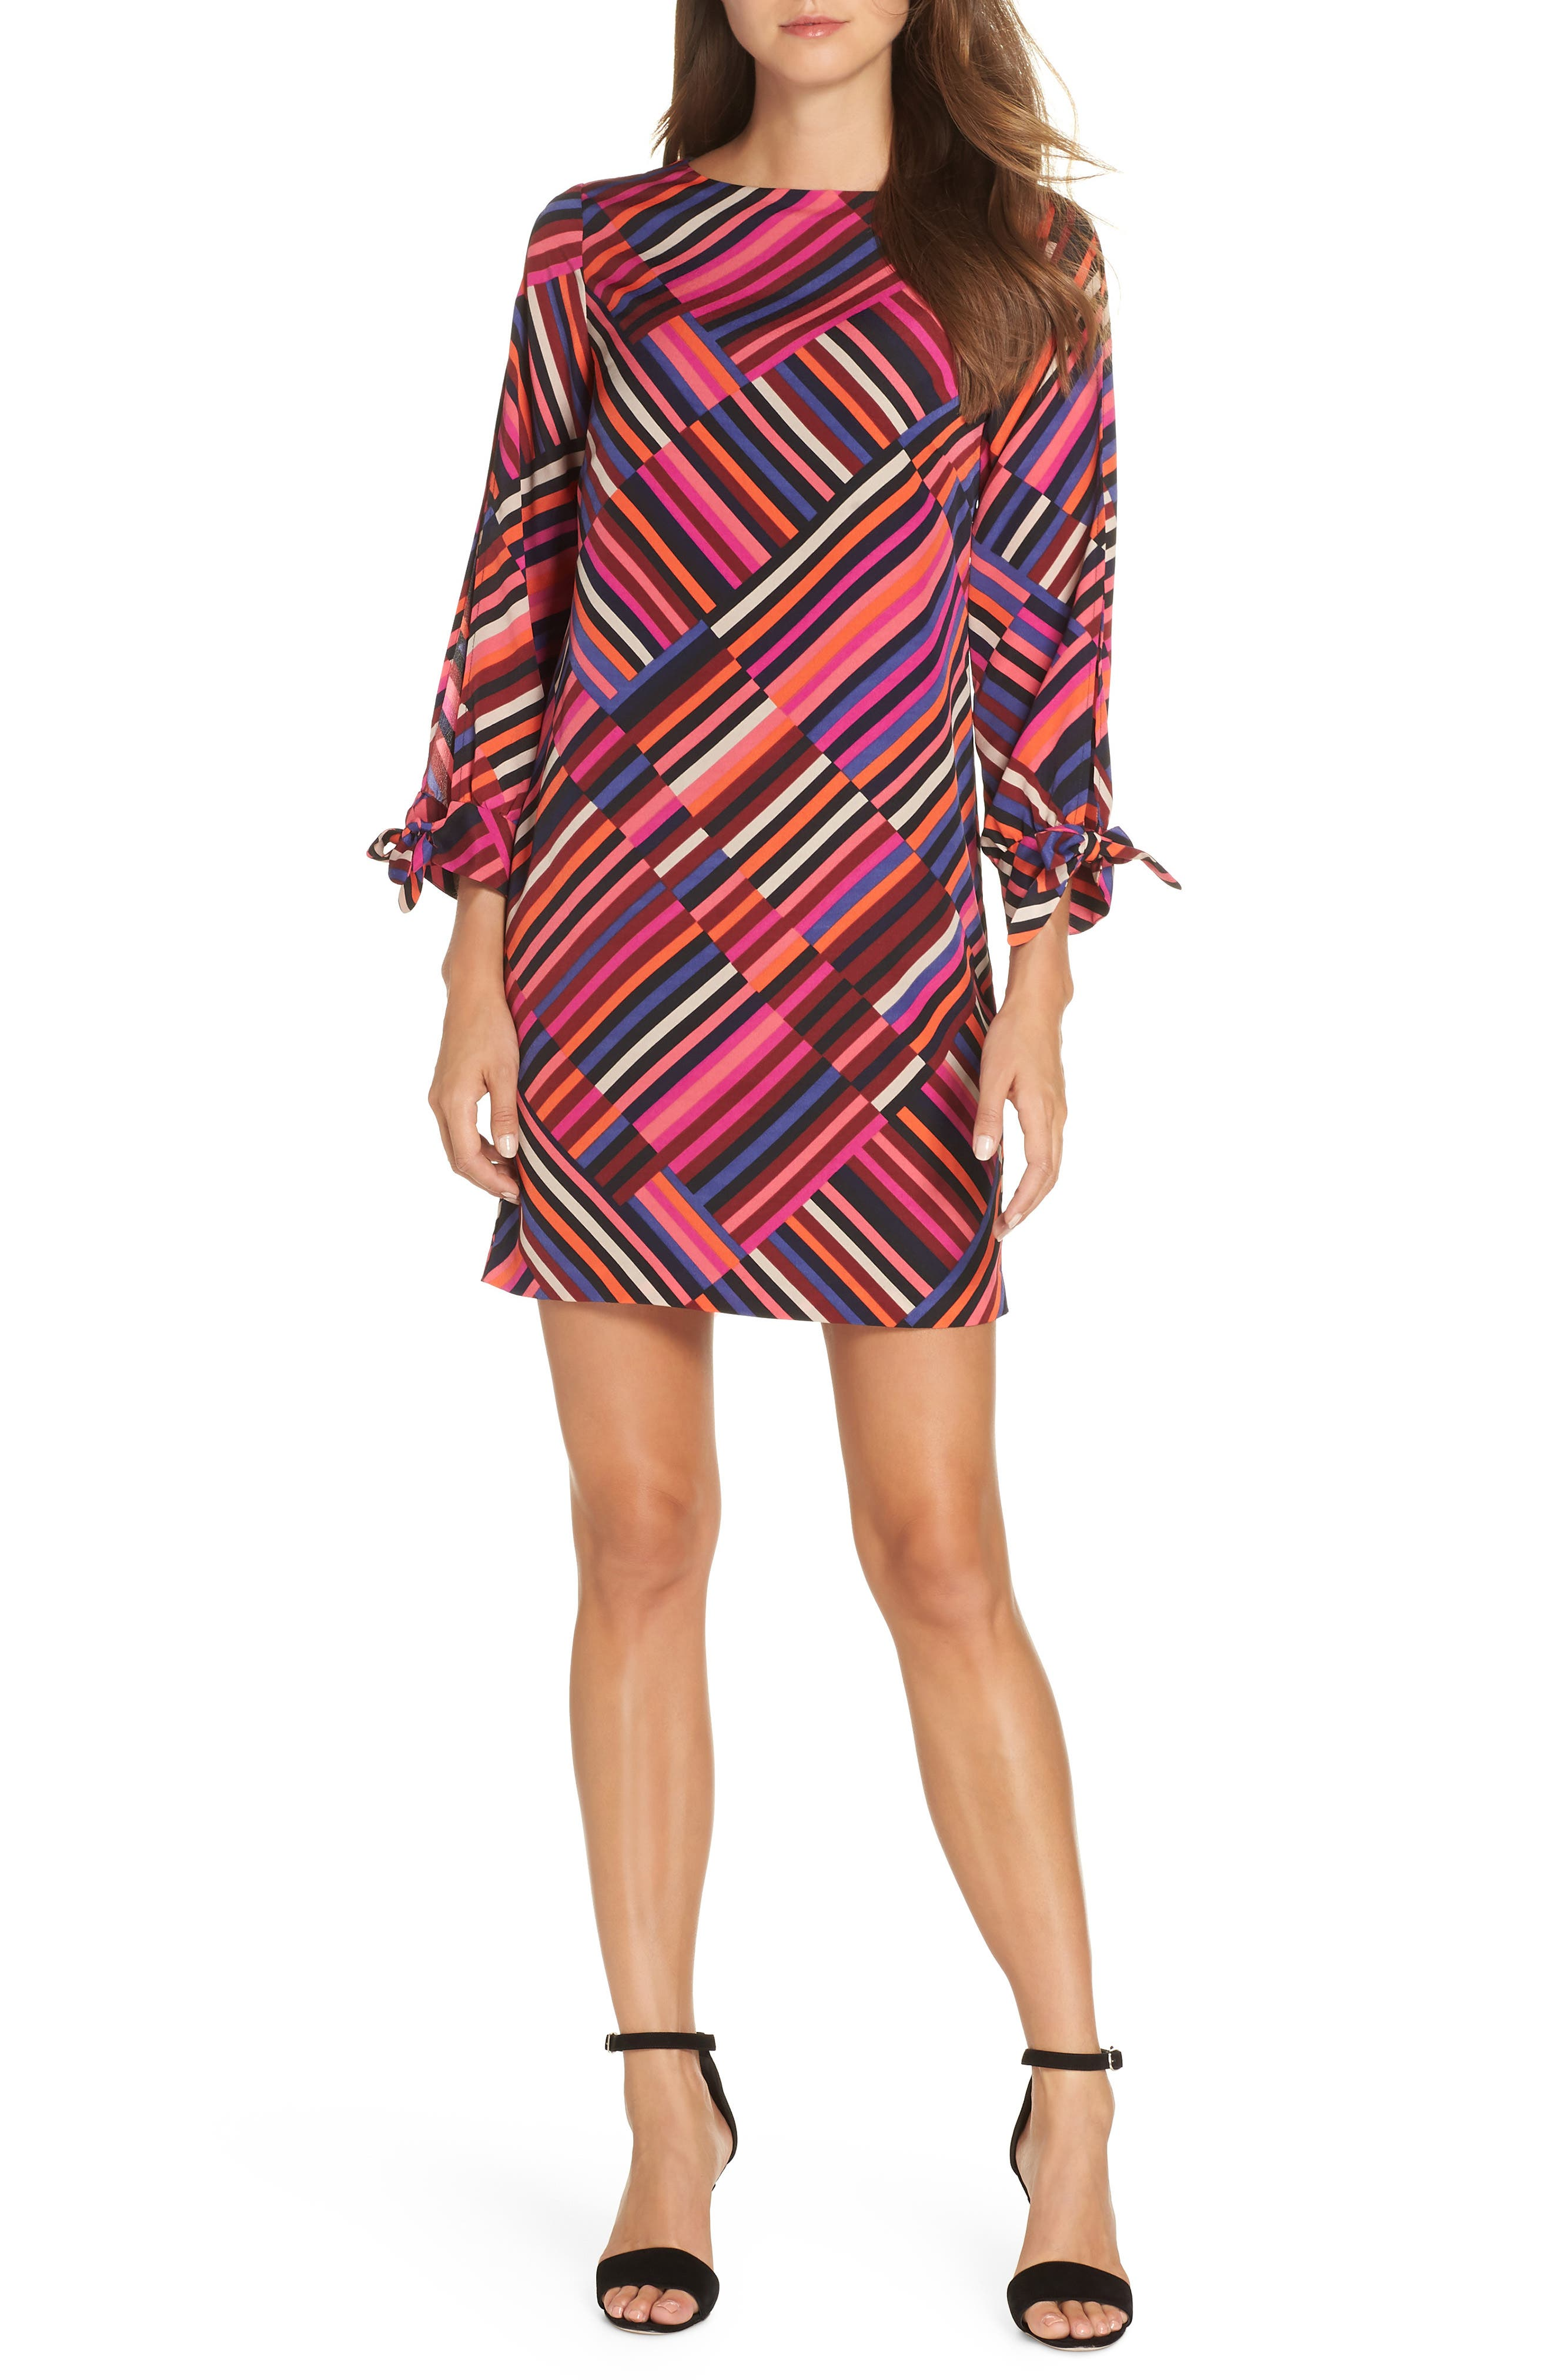 Jaxon Chiffon Dress,                             Main thumbnail 1, color,                             MULTI